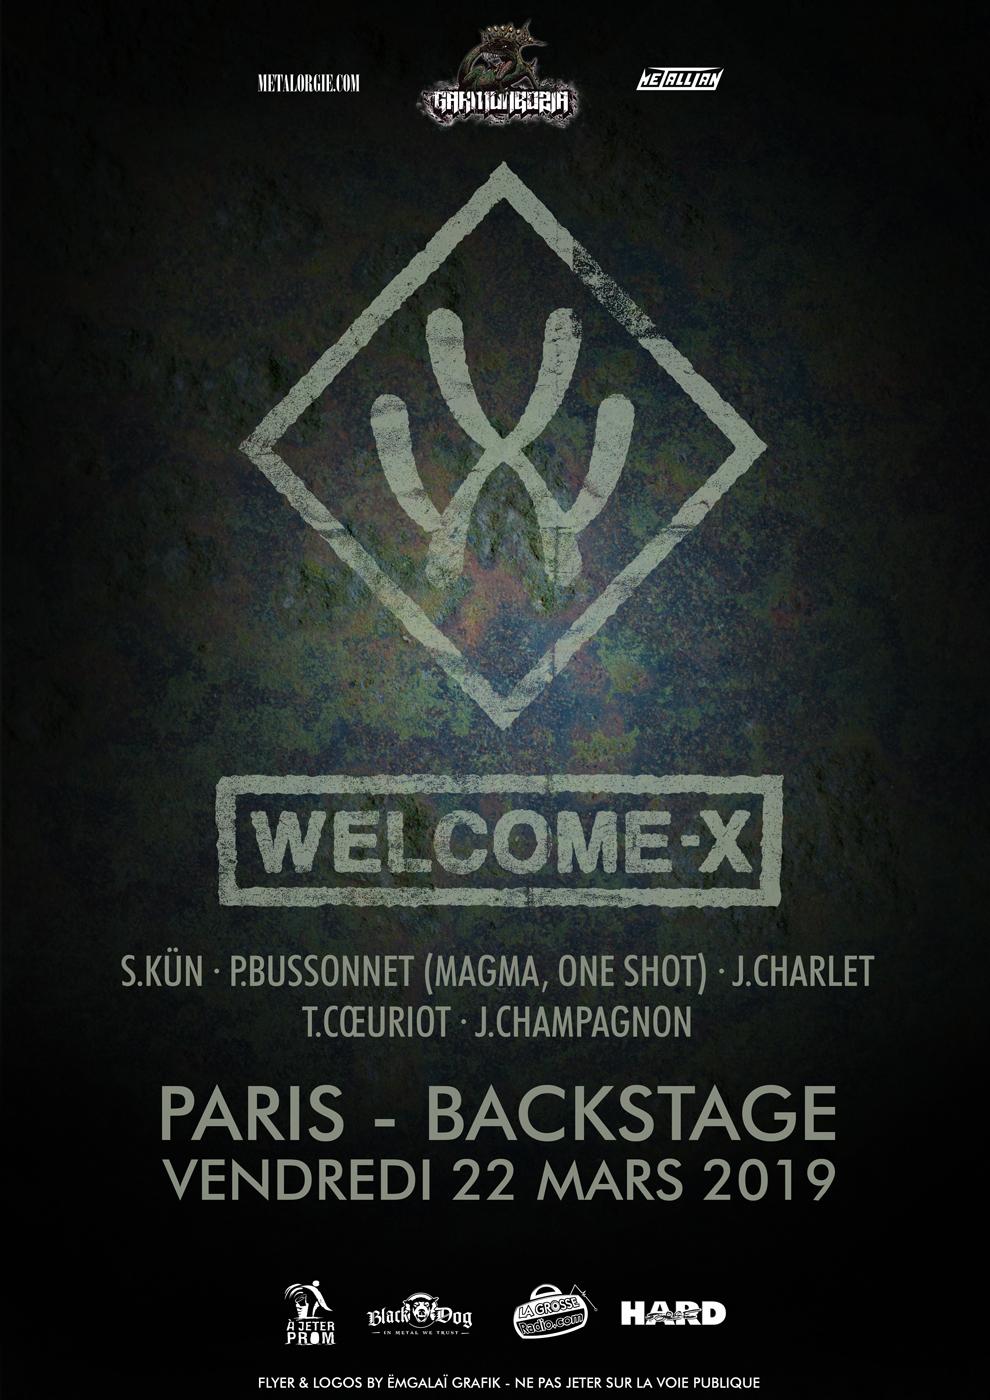 Welcome-X, Paris, Nantes, Tour, 2019